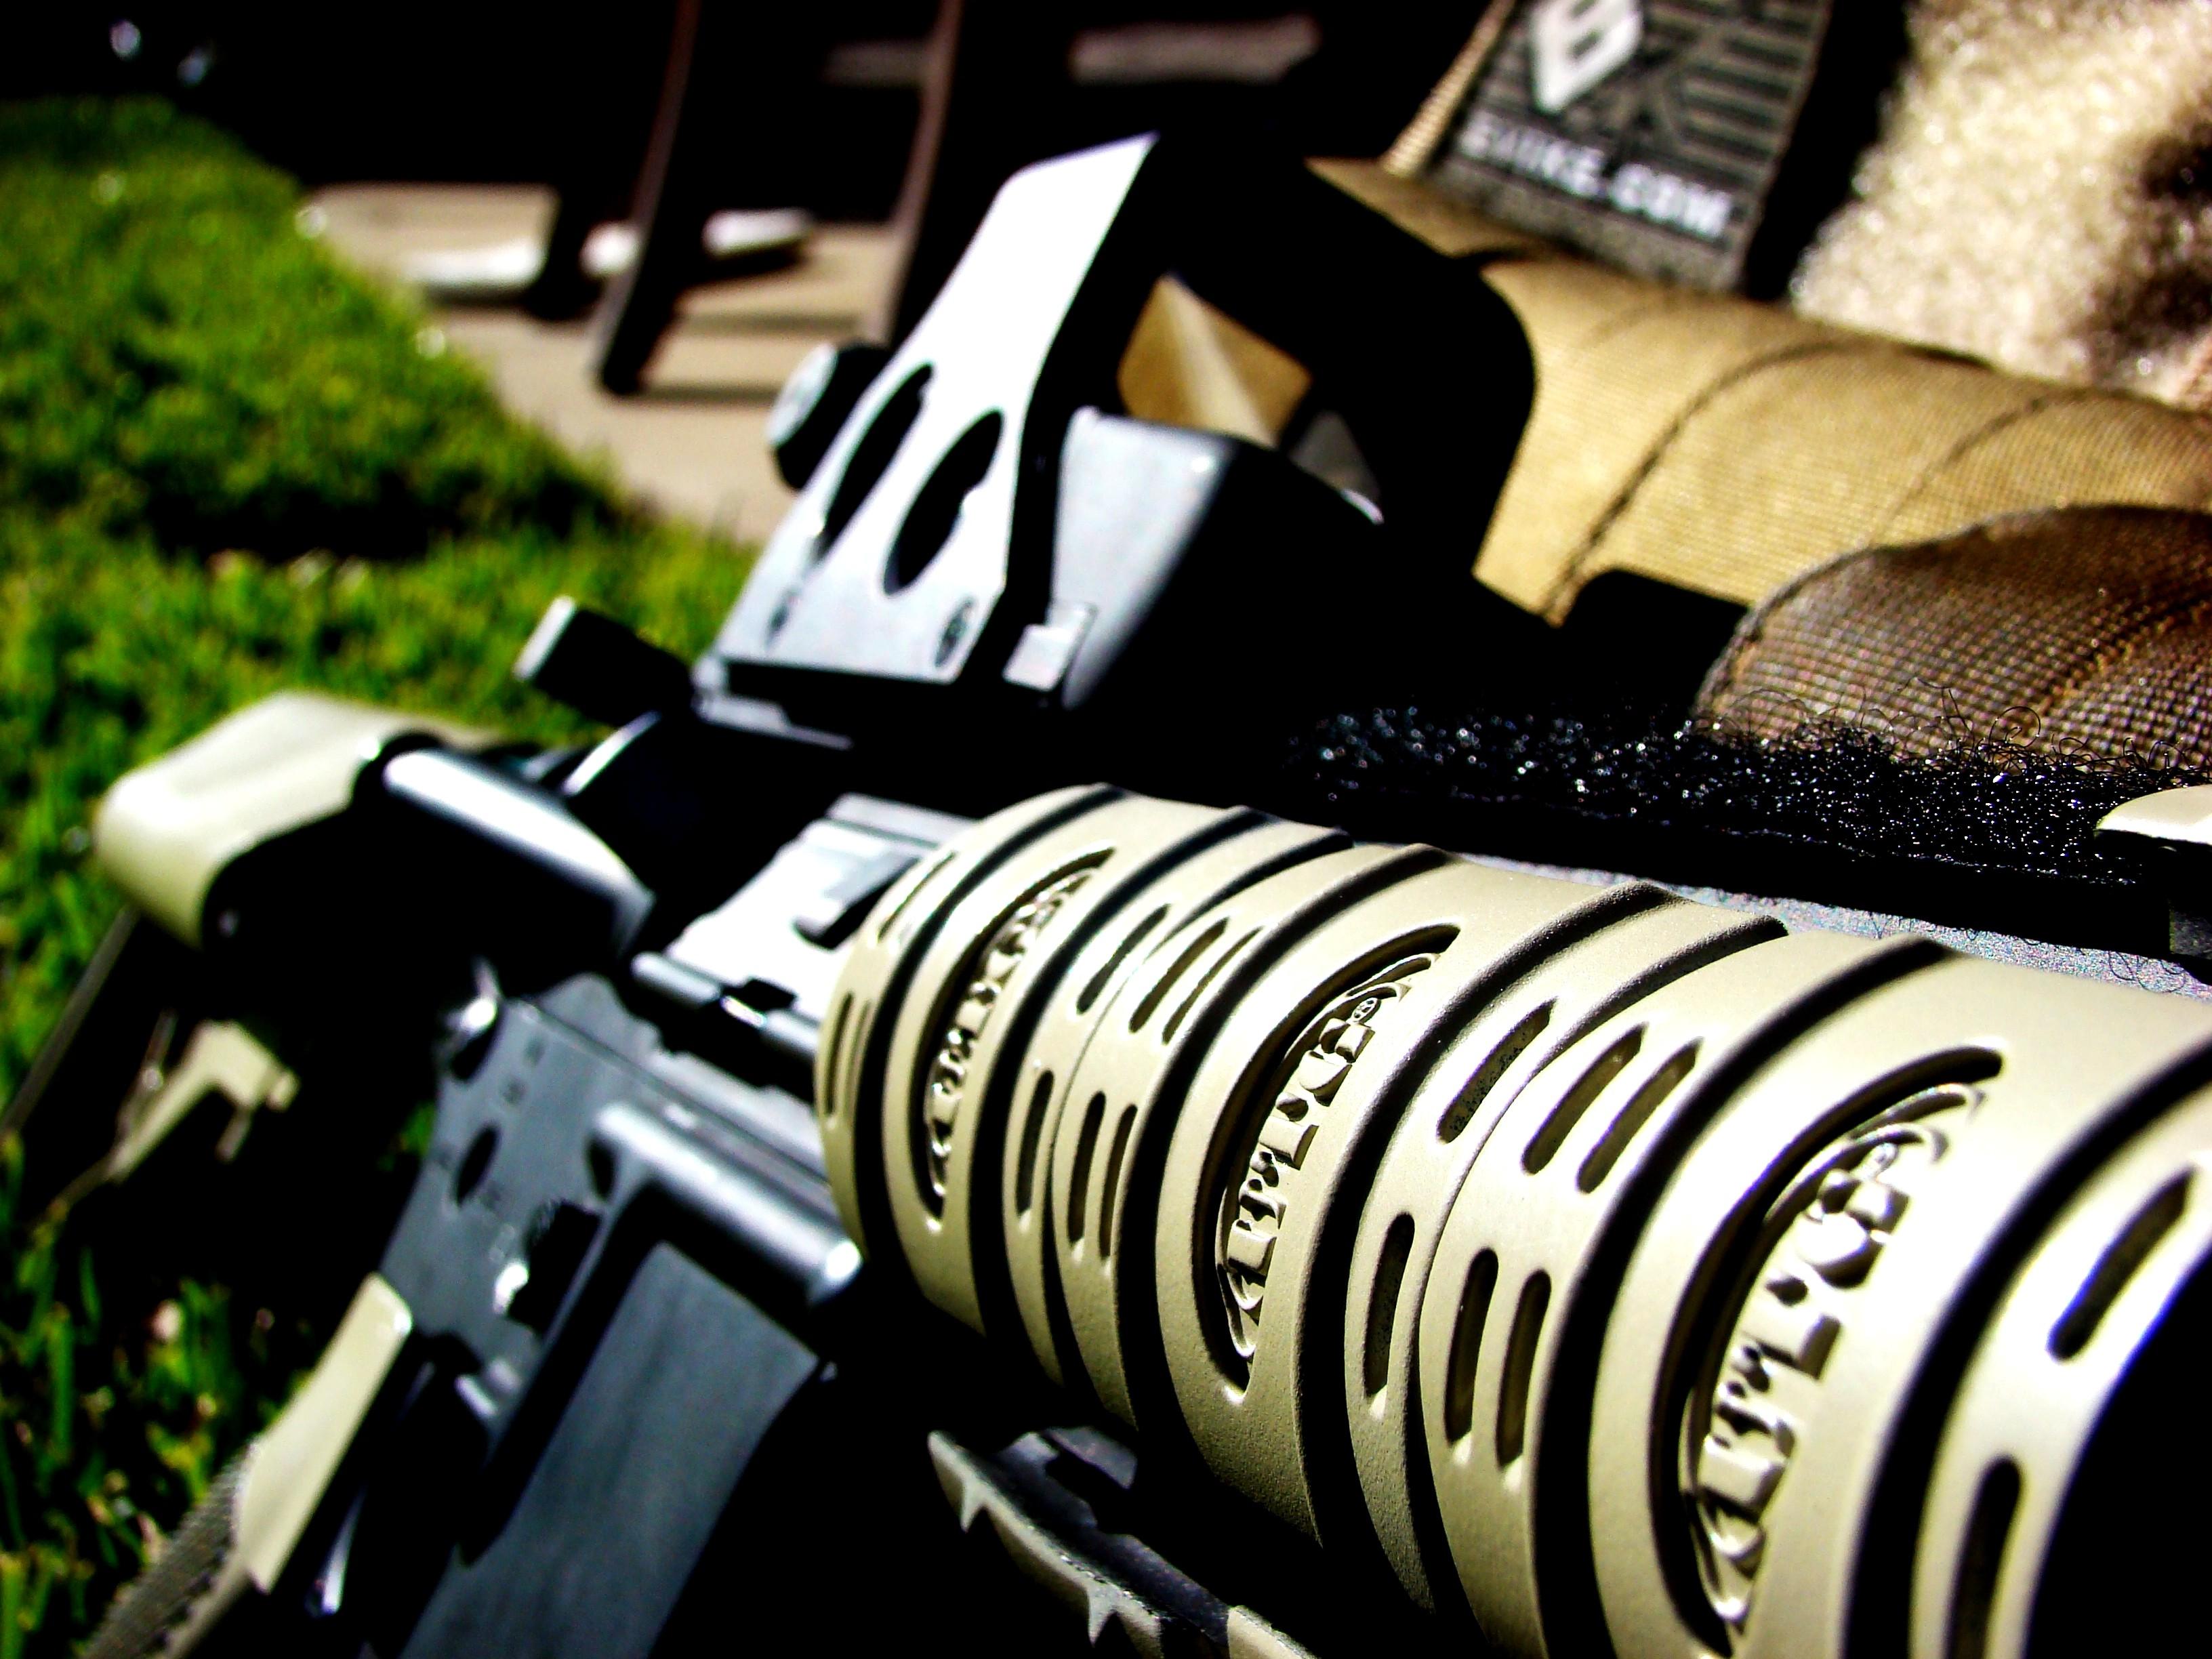 Assault Rifle Hd Wallpaper Background Image 3264x2448 Id